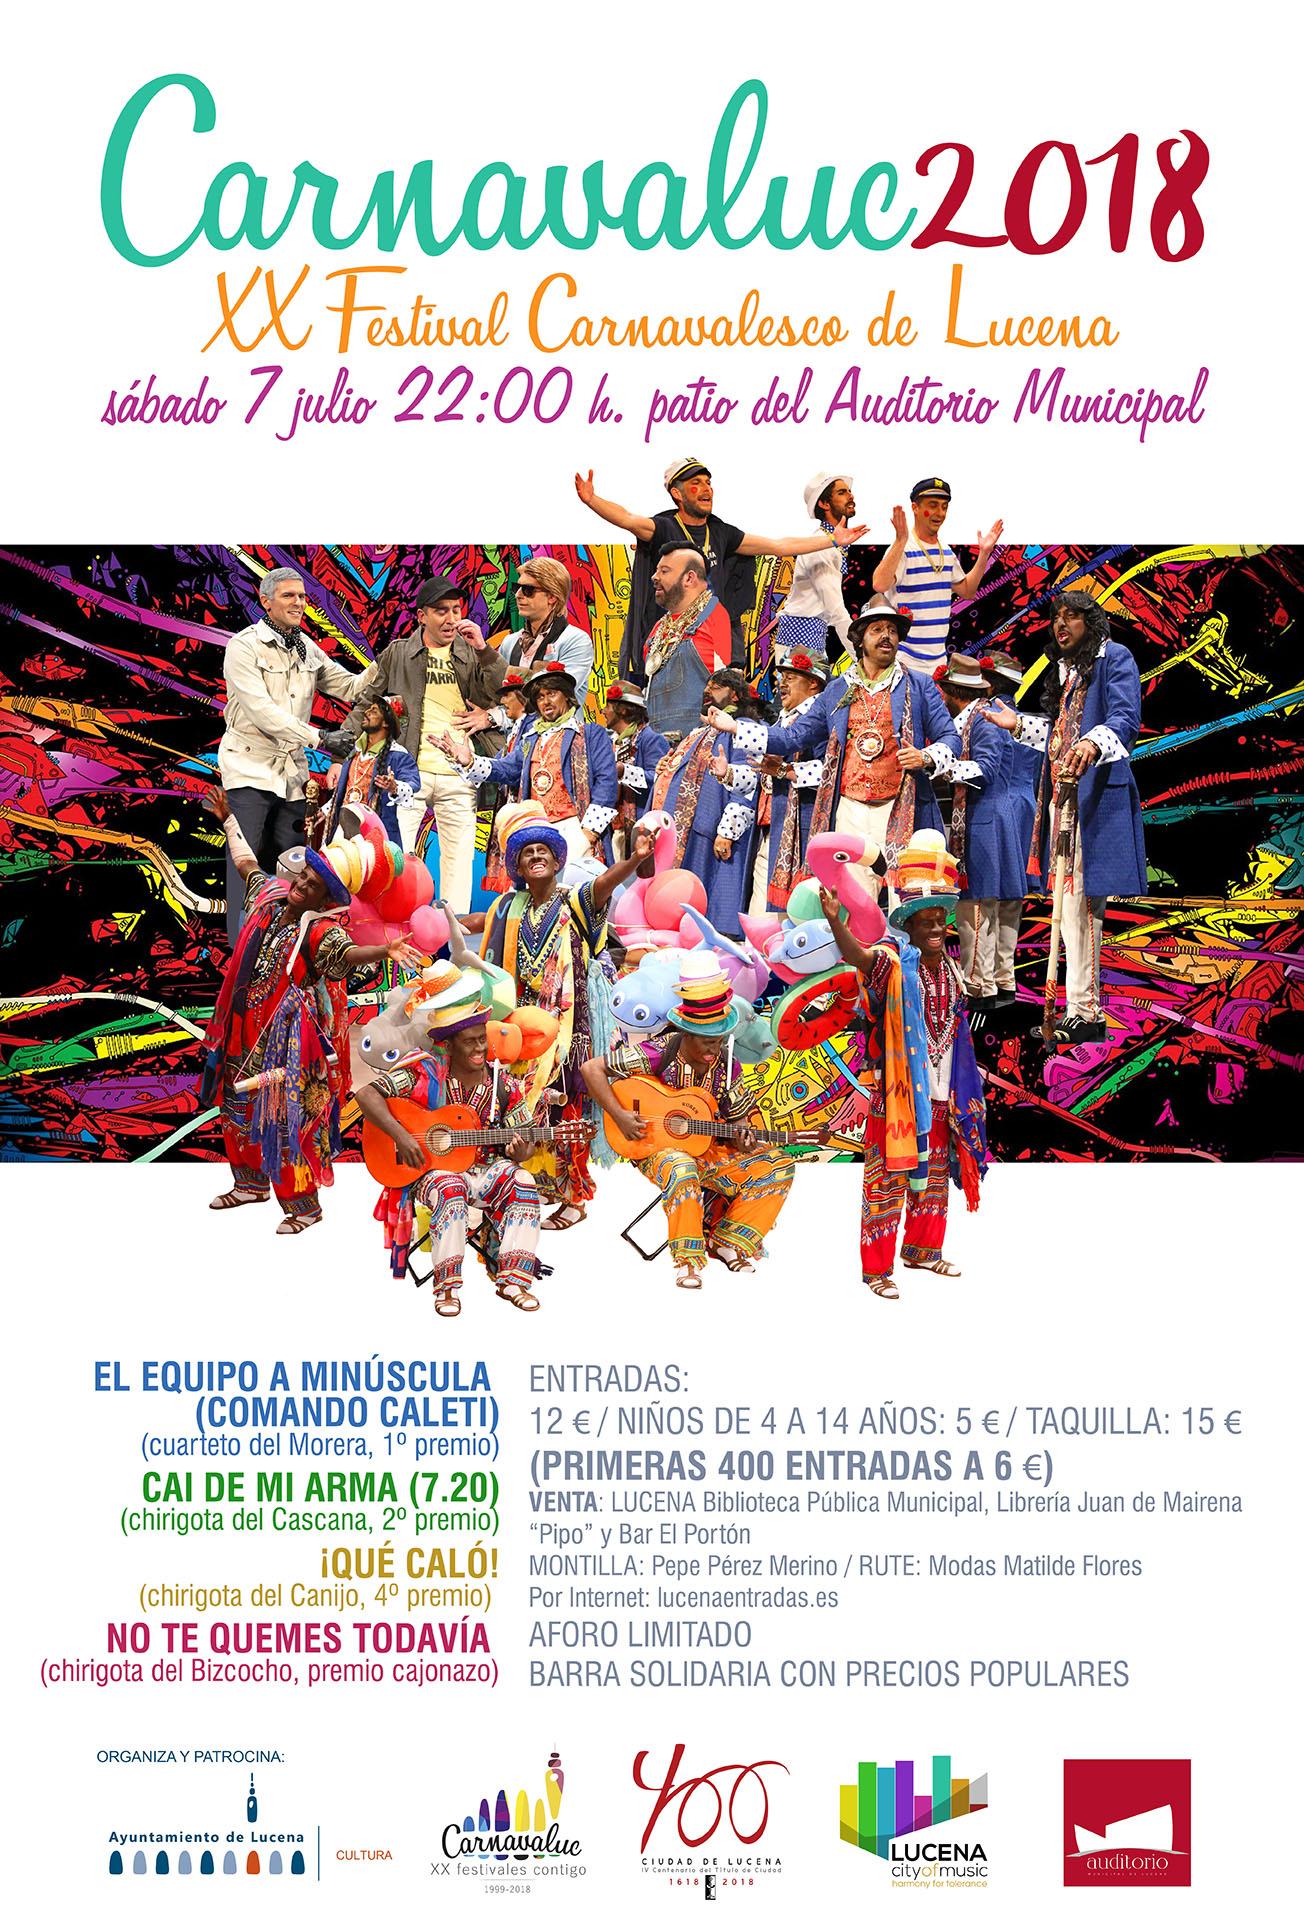 XX Carnavaluc 2018 @ Patio Auditorio Municipal